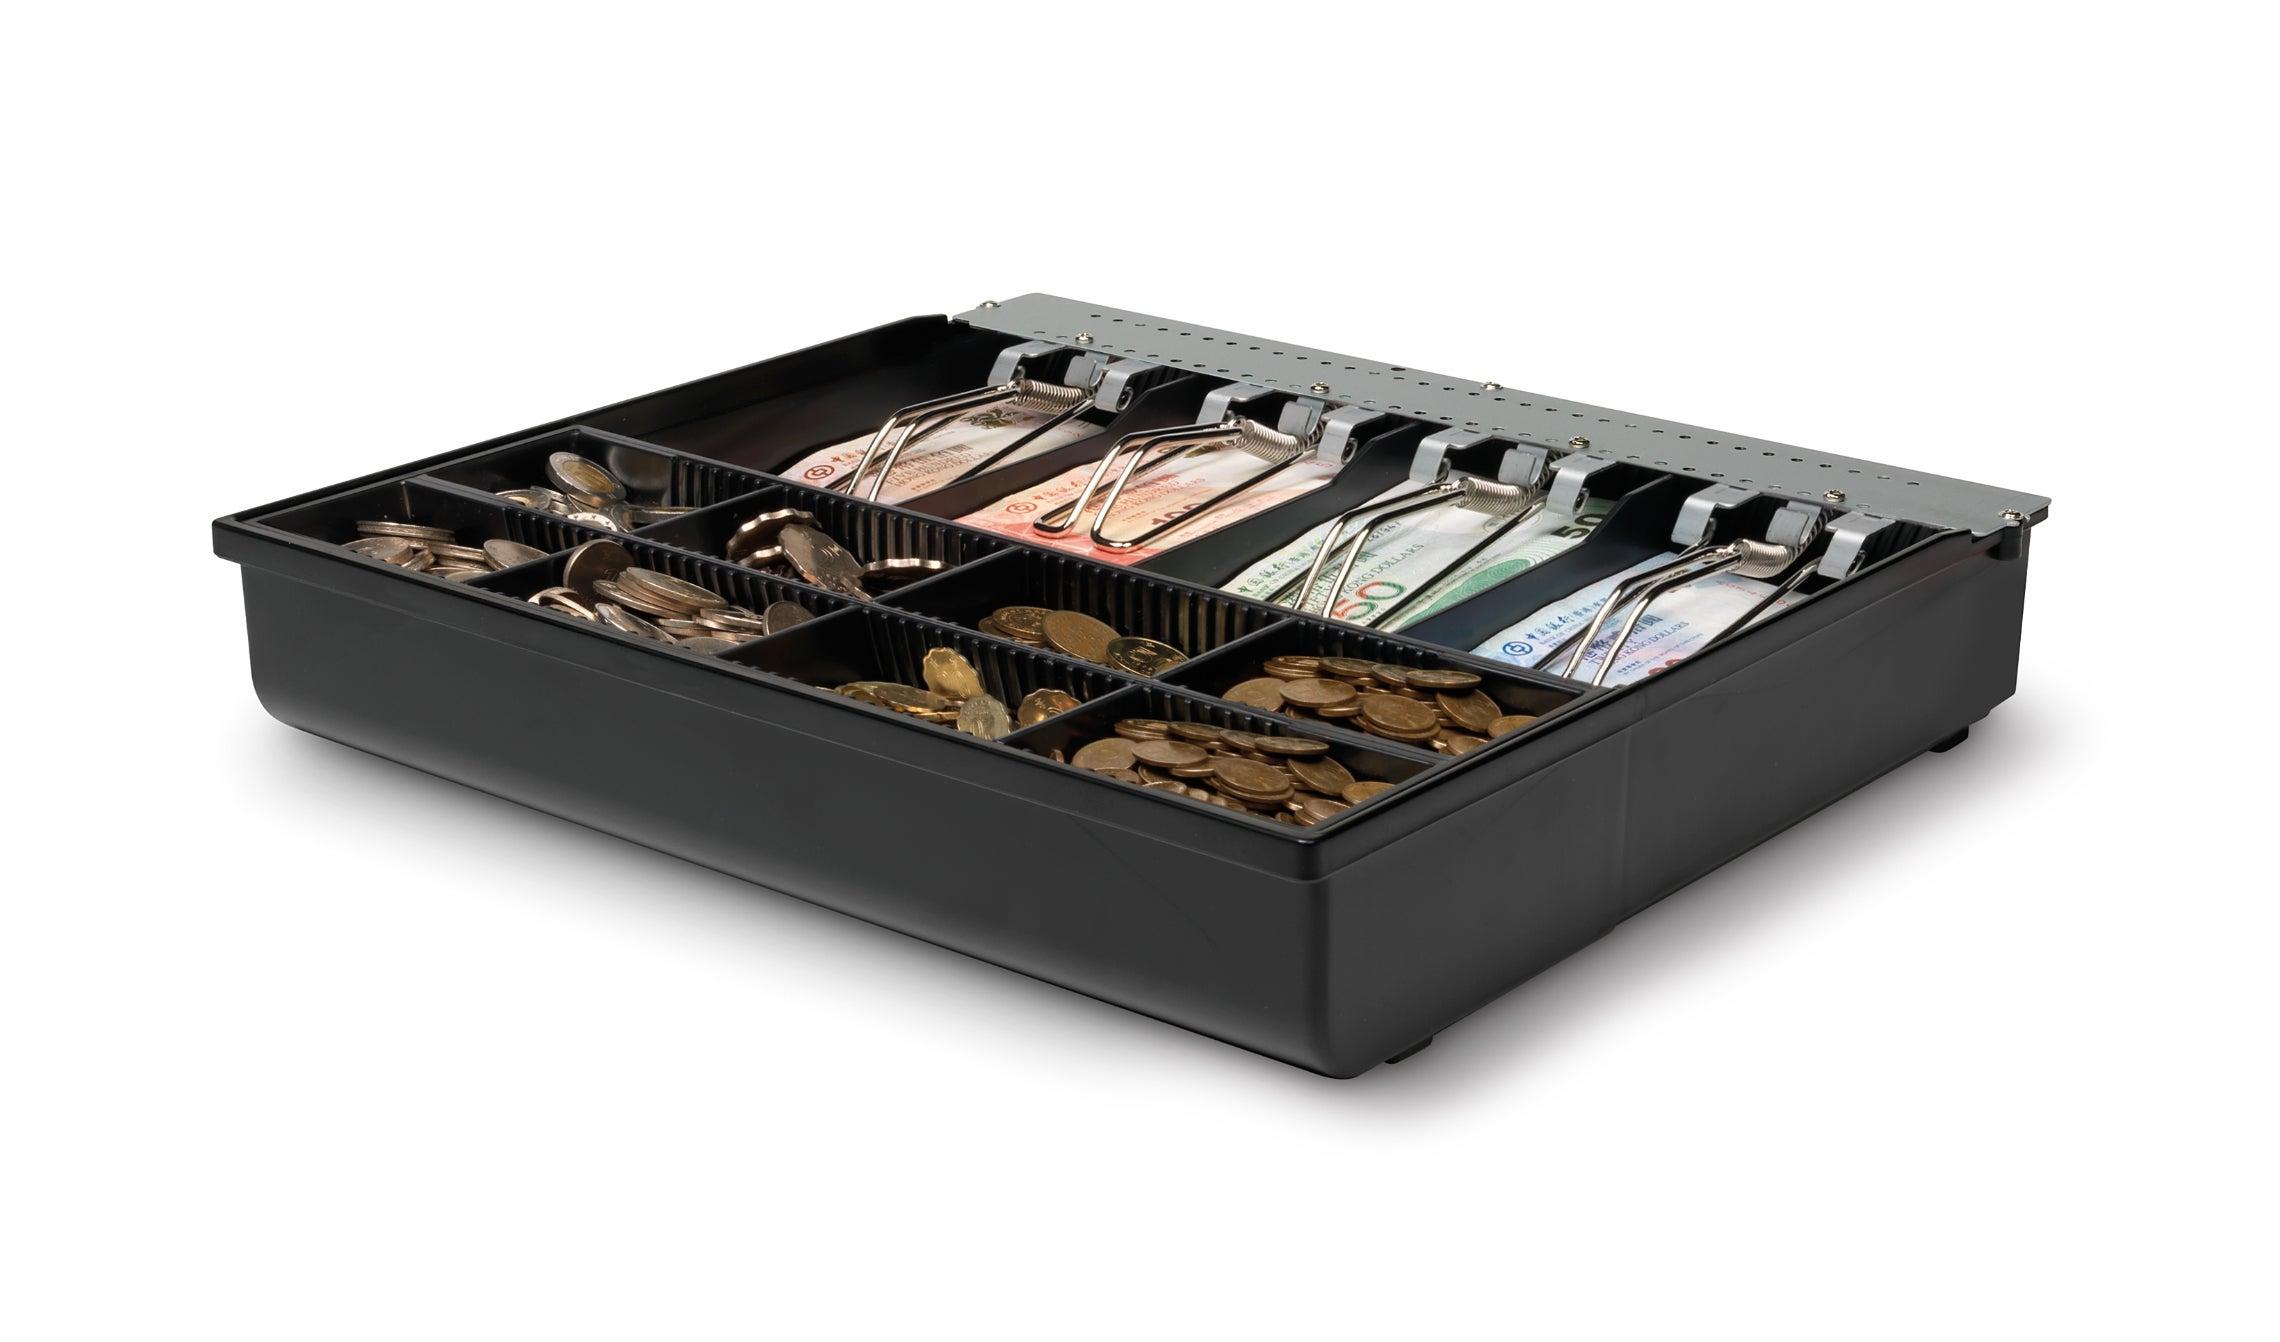 safescan-3540t-cash-drawer-tray